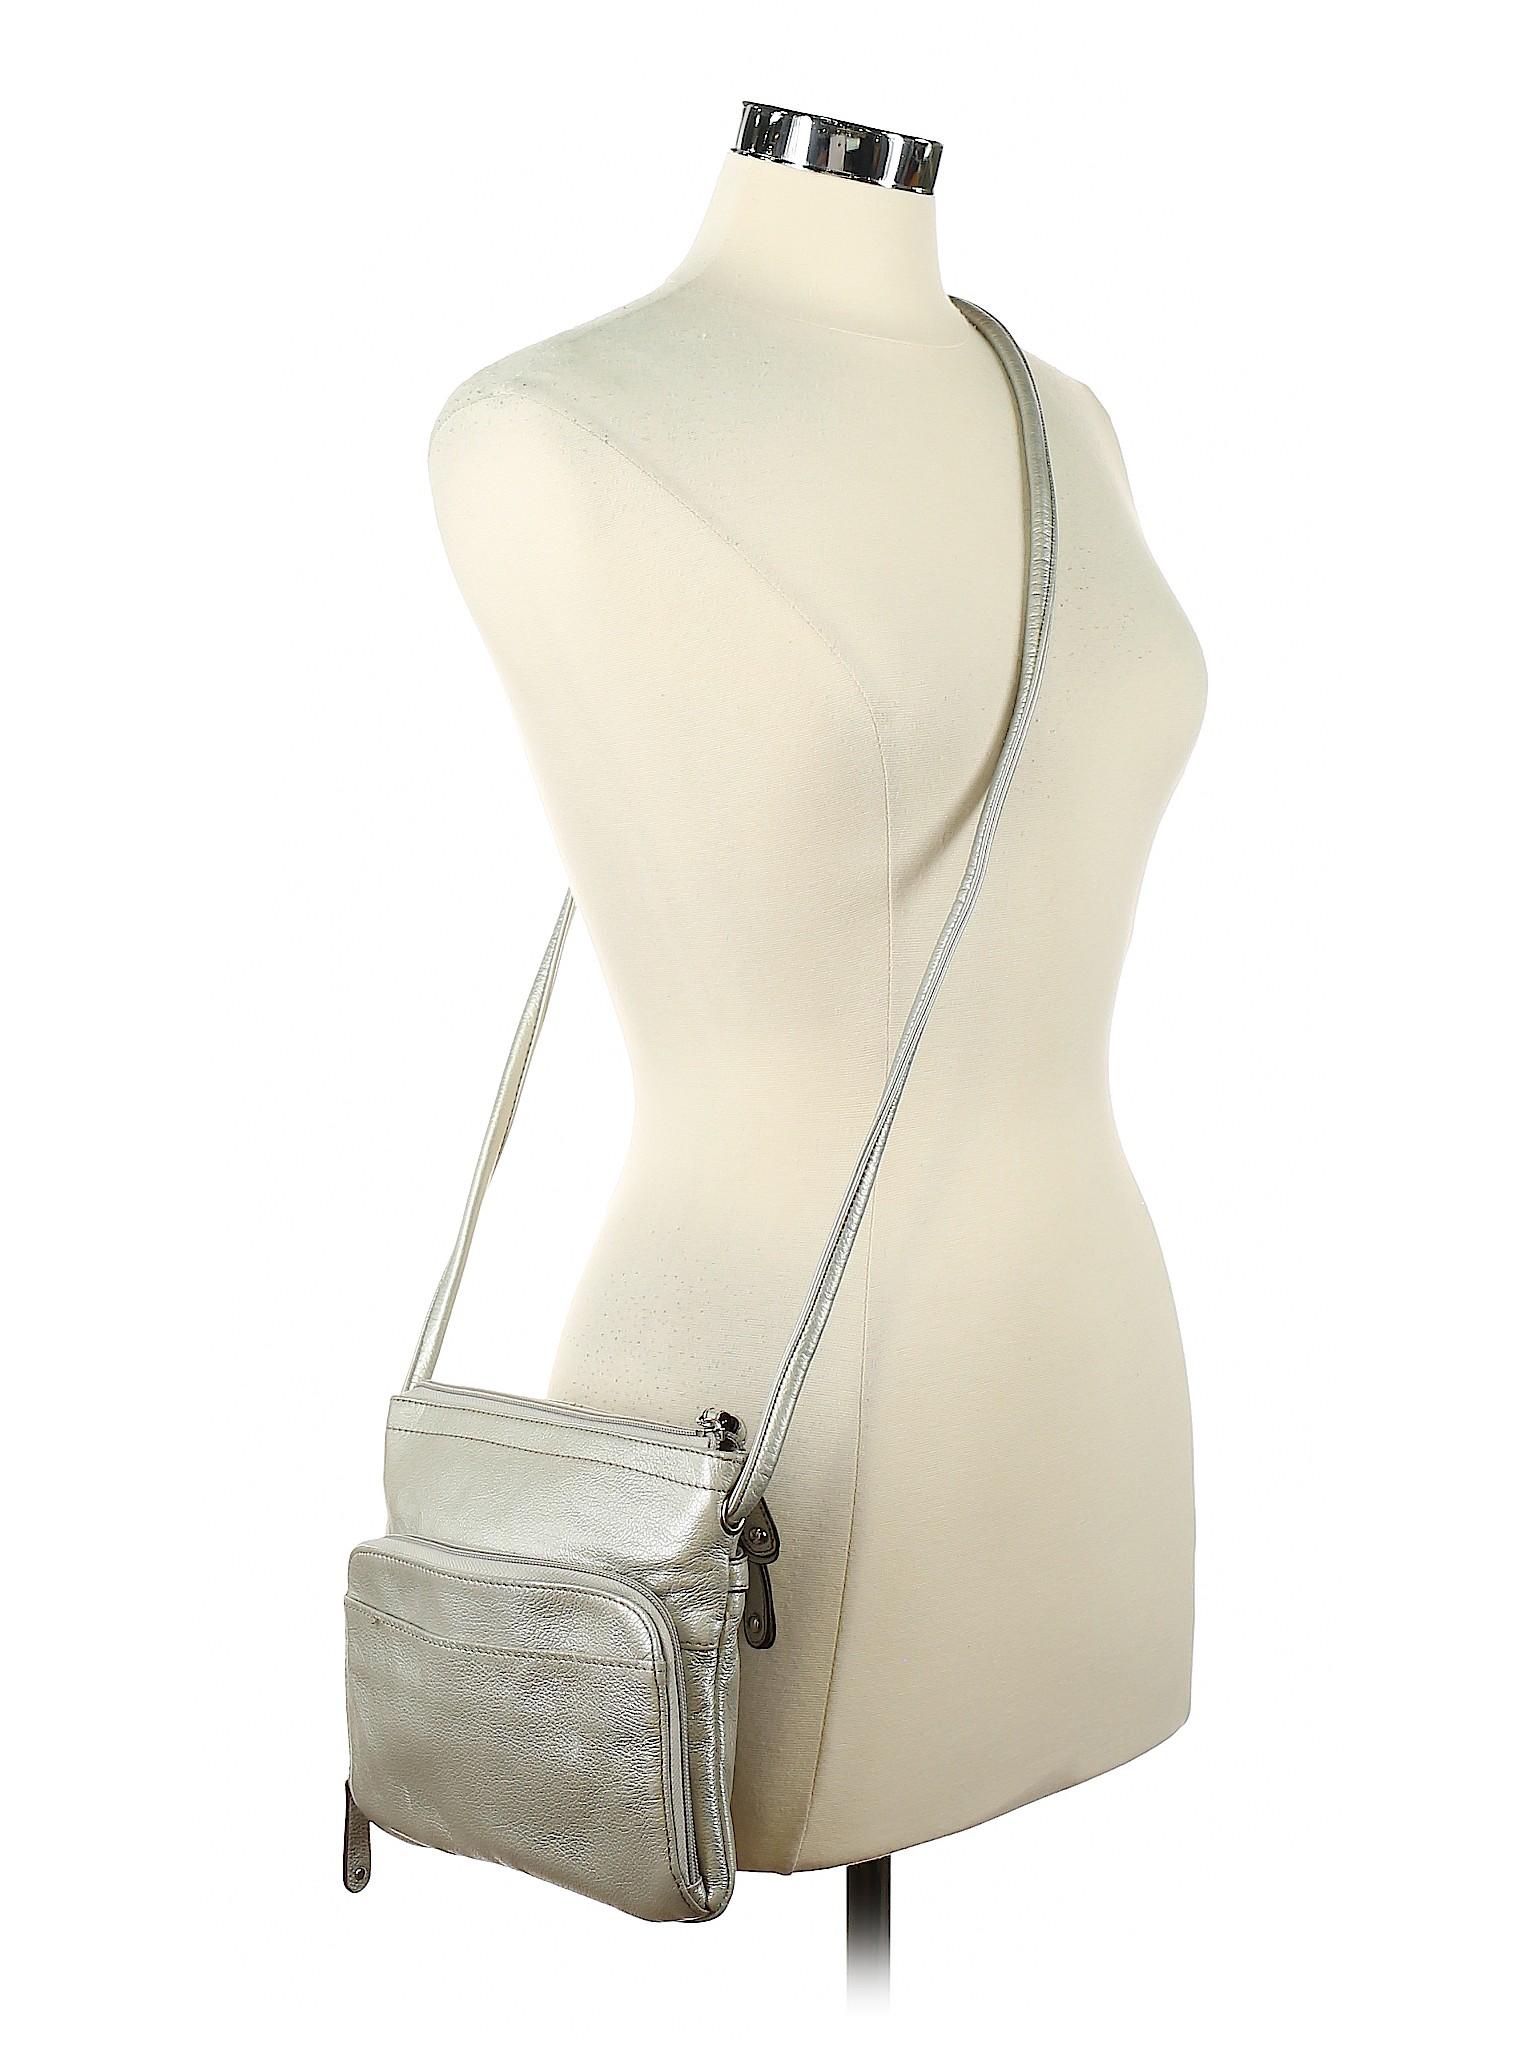 fbea65b034 Clarks Metallic Silver Crossbody Bag One Size - 91% off   thredUP